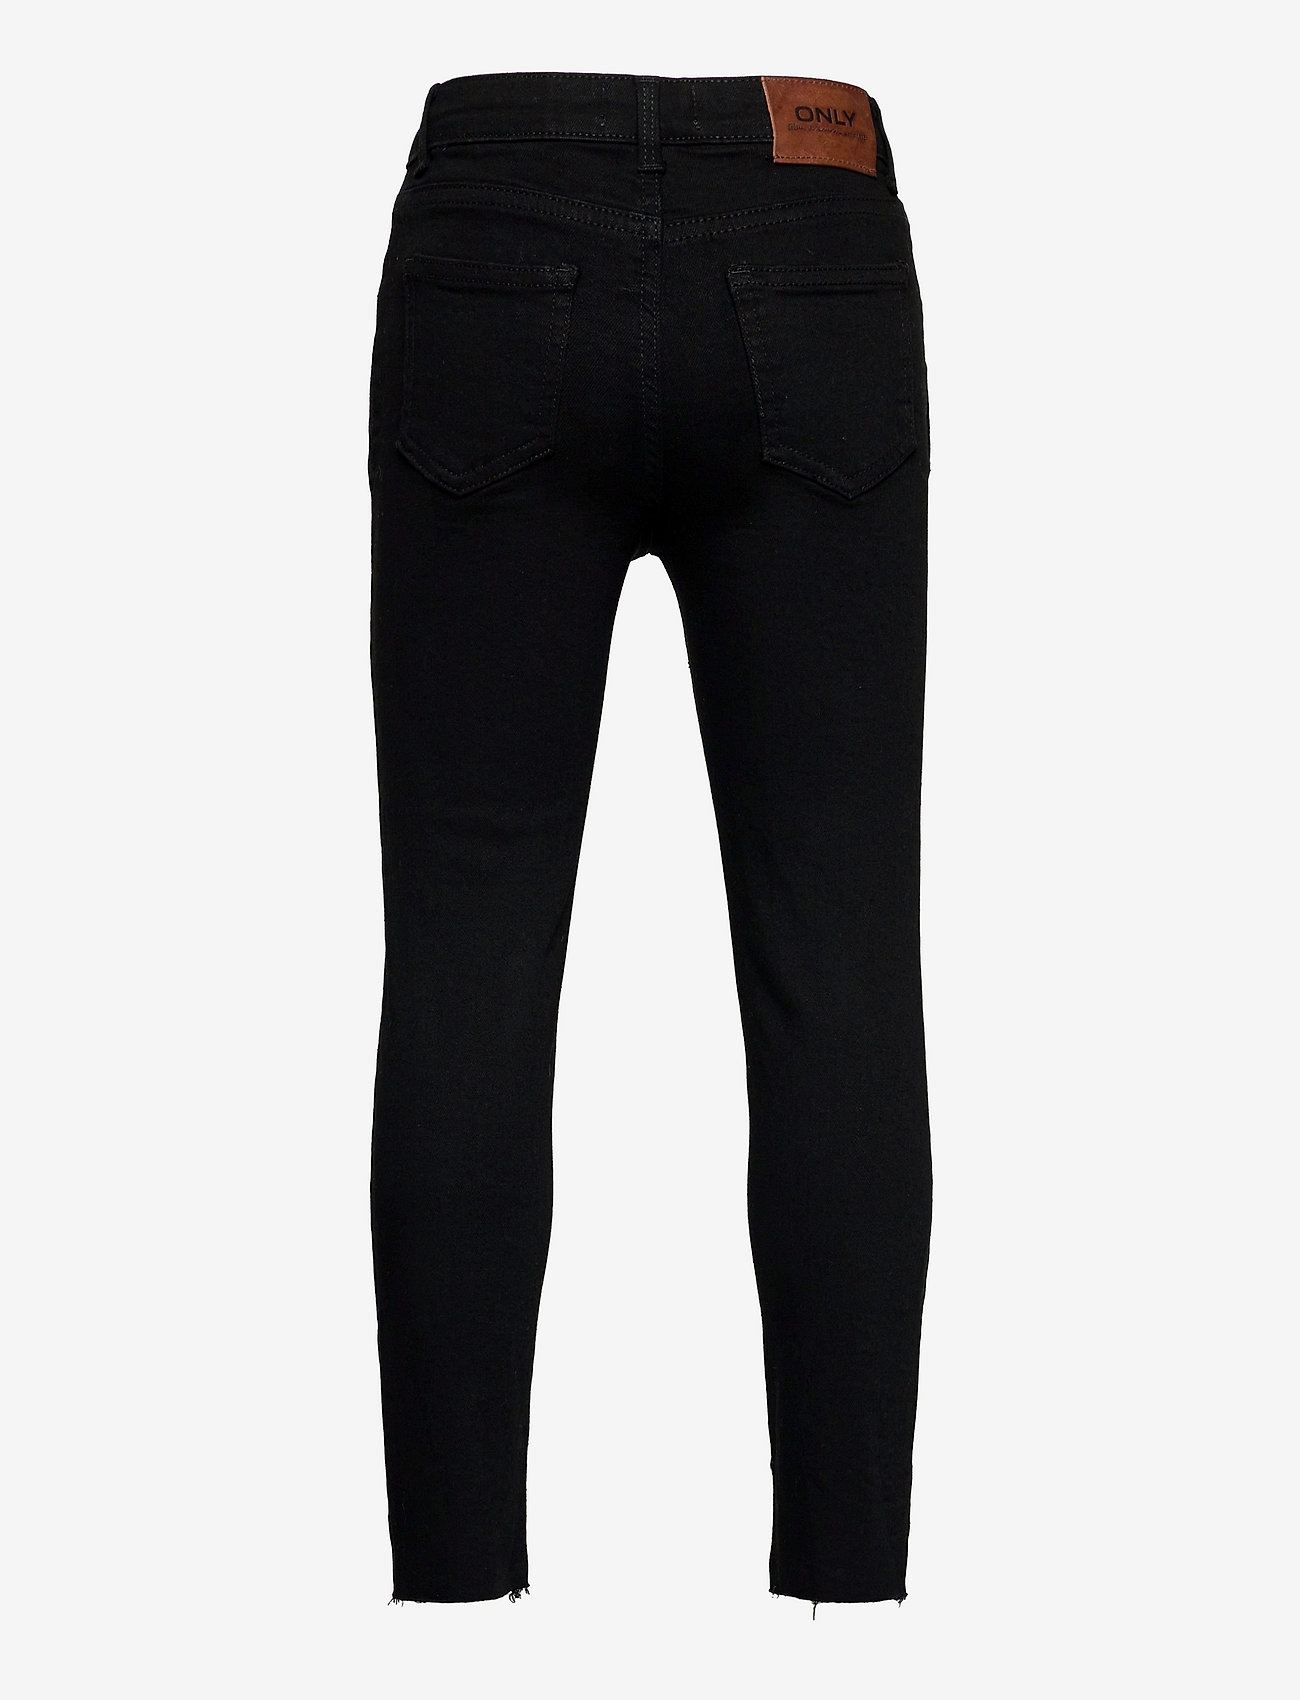 Kids Only - KONEMILY LIFE ST RAW  BLACK JEANS AZG161 - jeans - black - 1